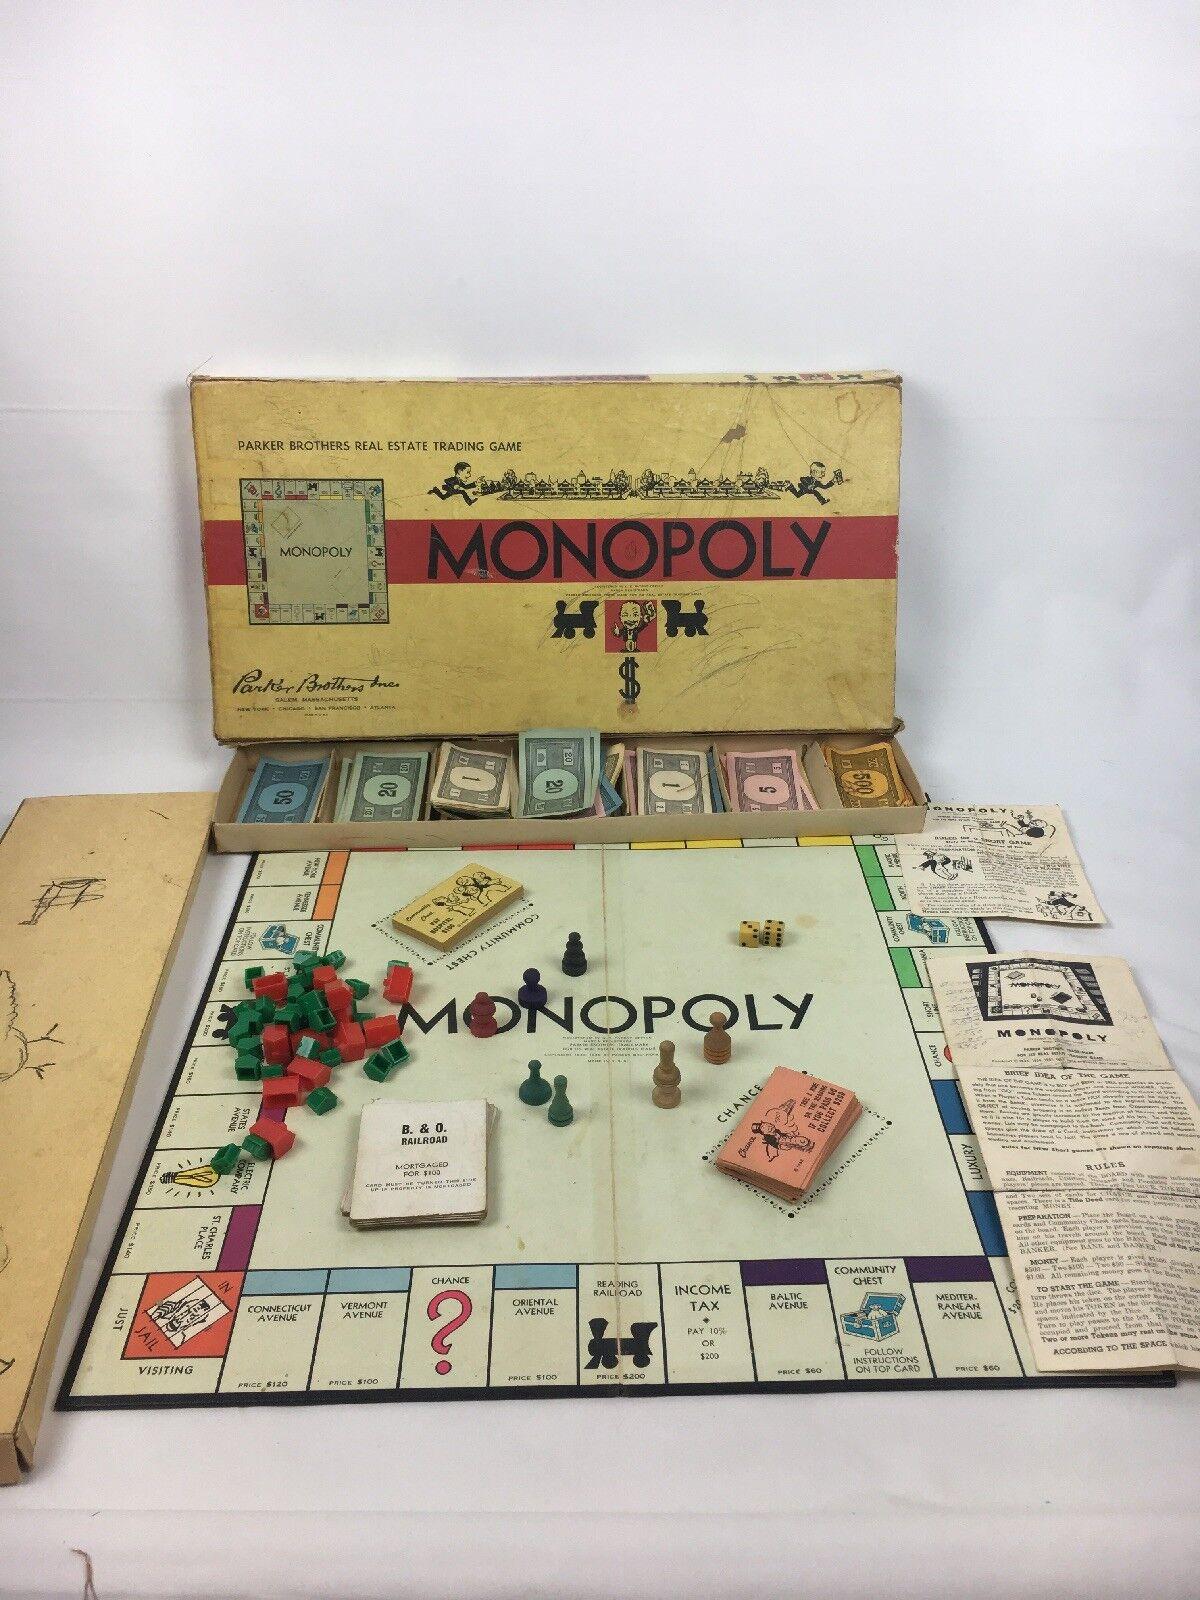 Jahrgang 1954 monopol alte brettspiel parker brothers einseitig geld holz - pcs